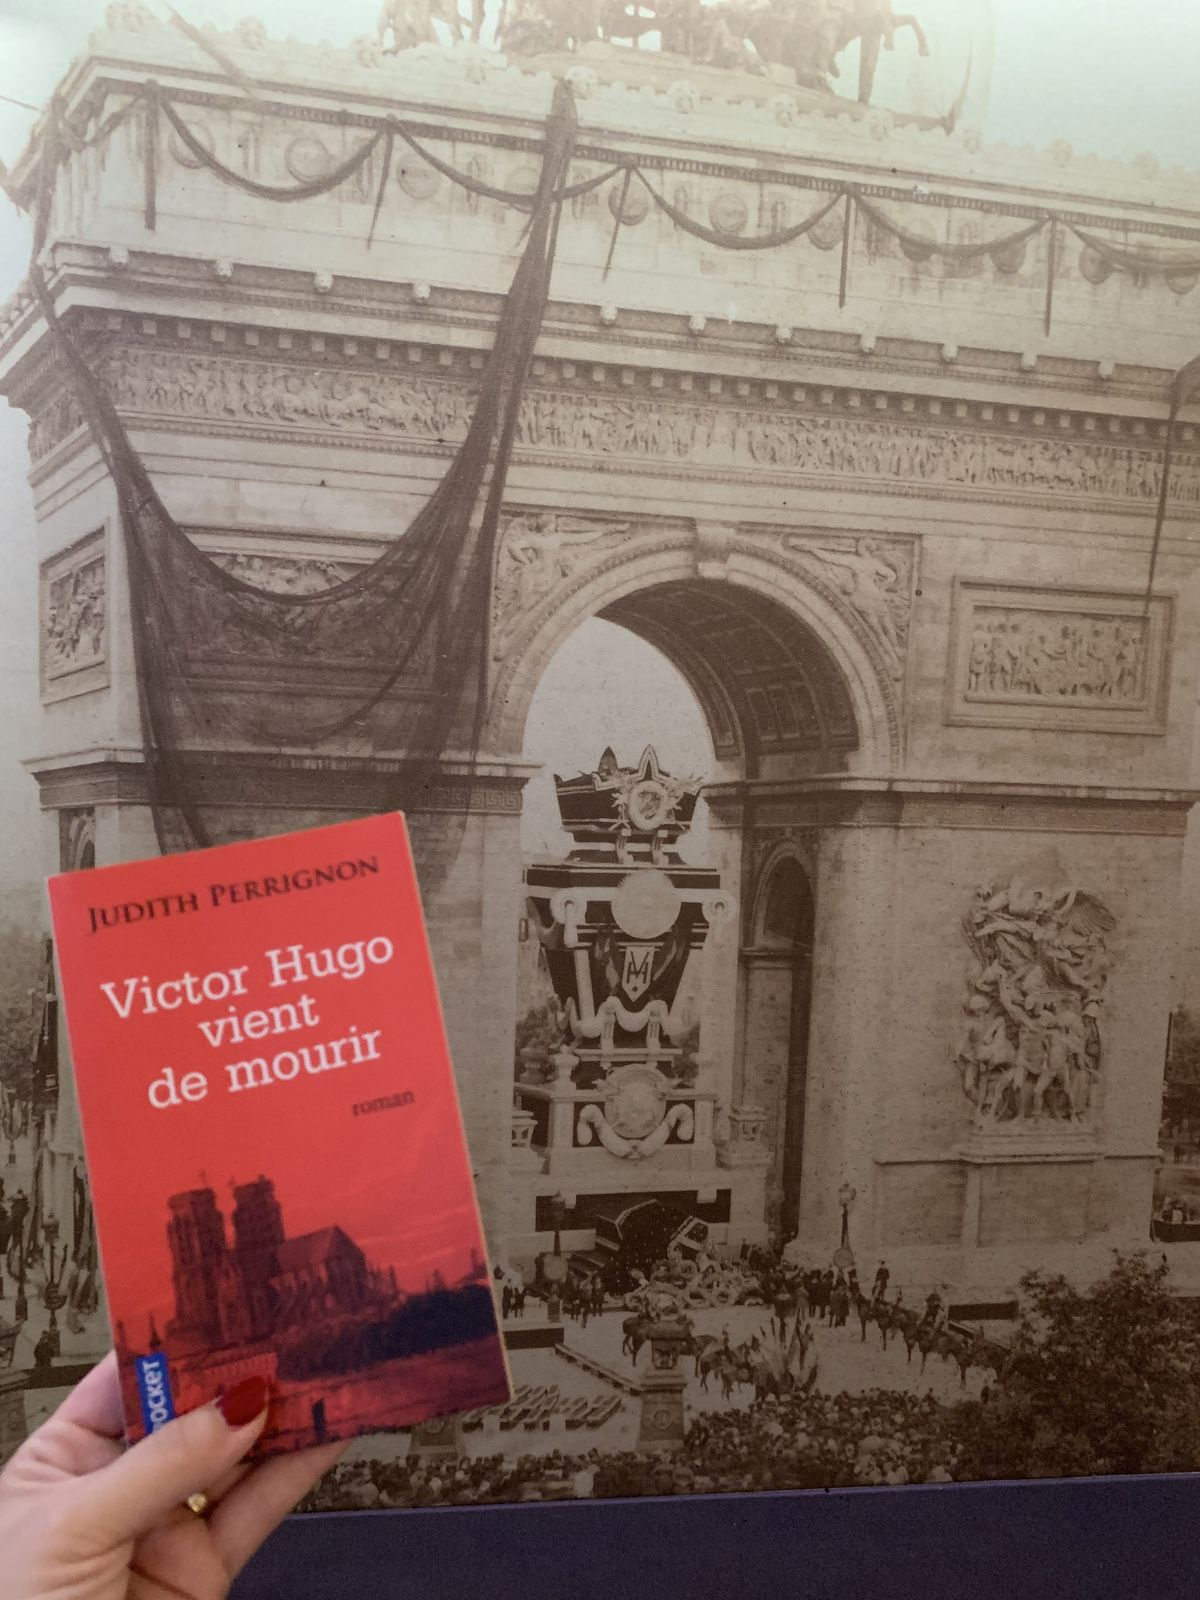 Victor Hugo vient de mourir - Judith Perrignon